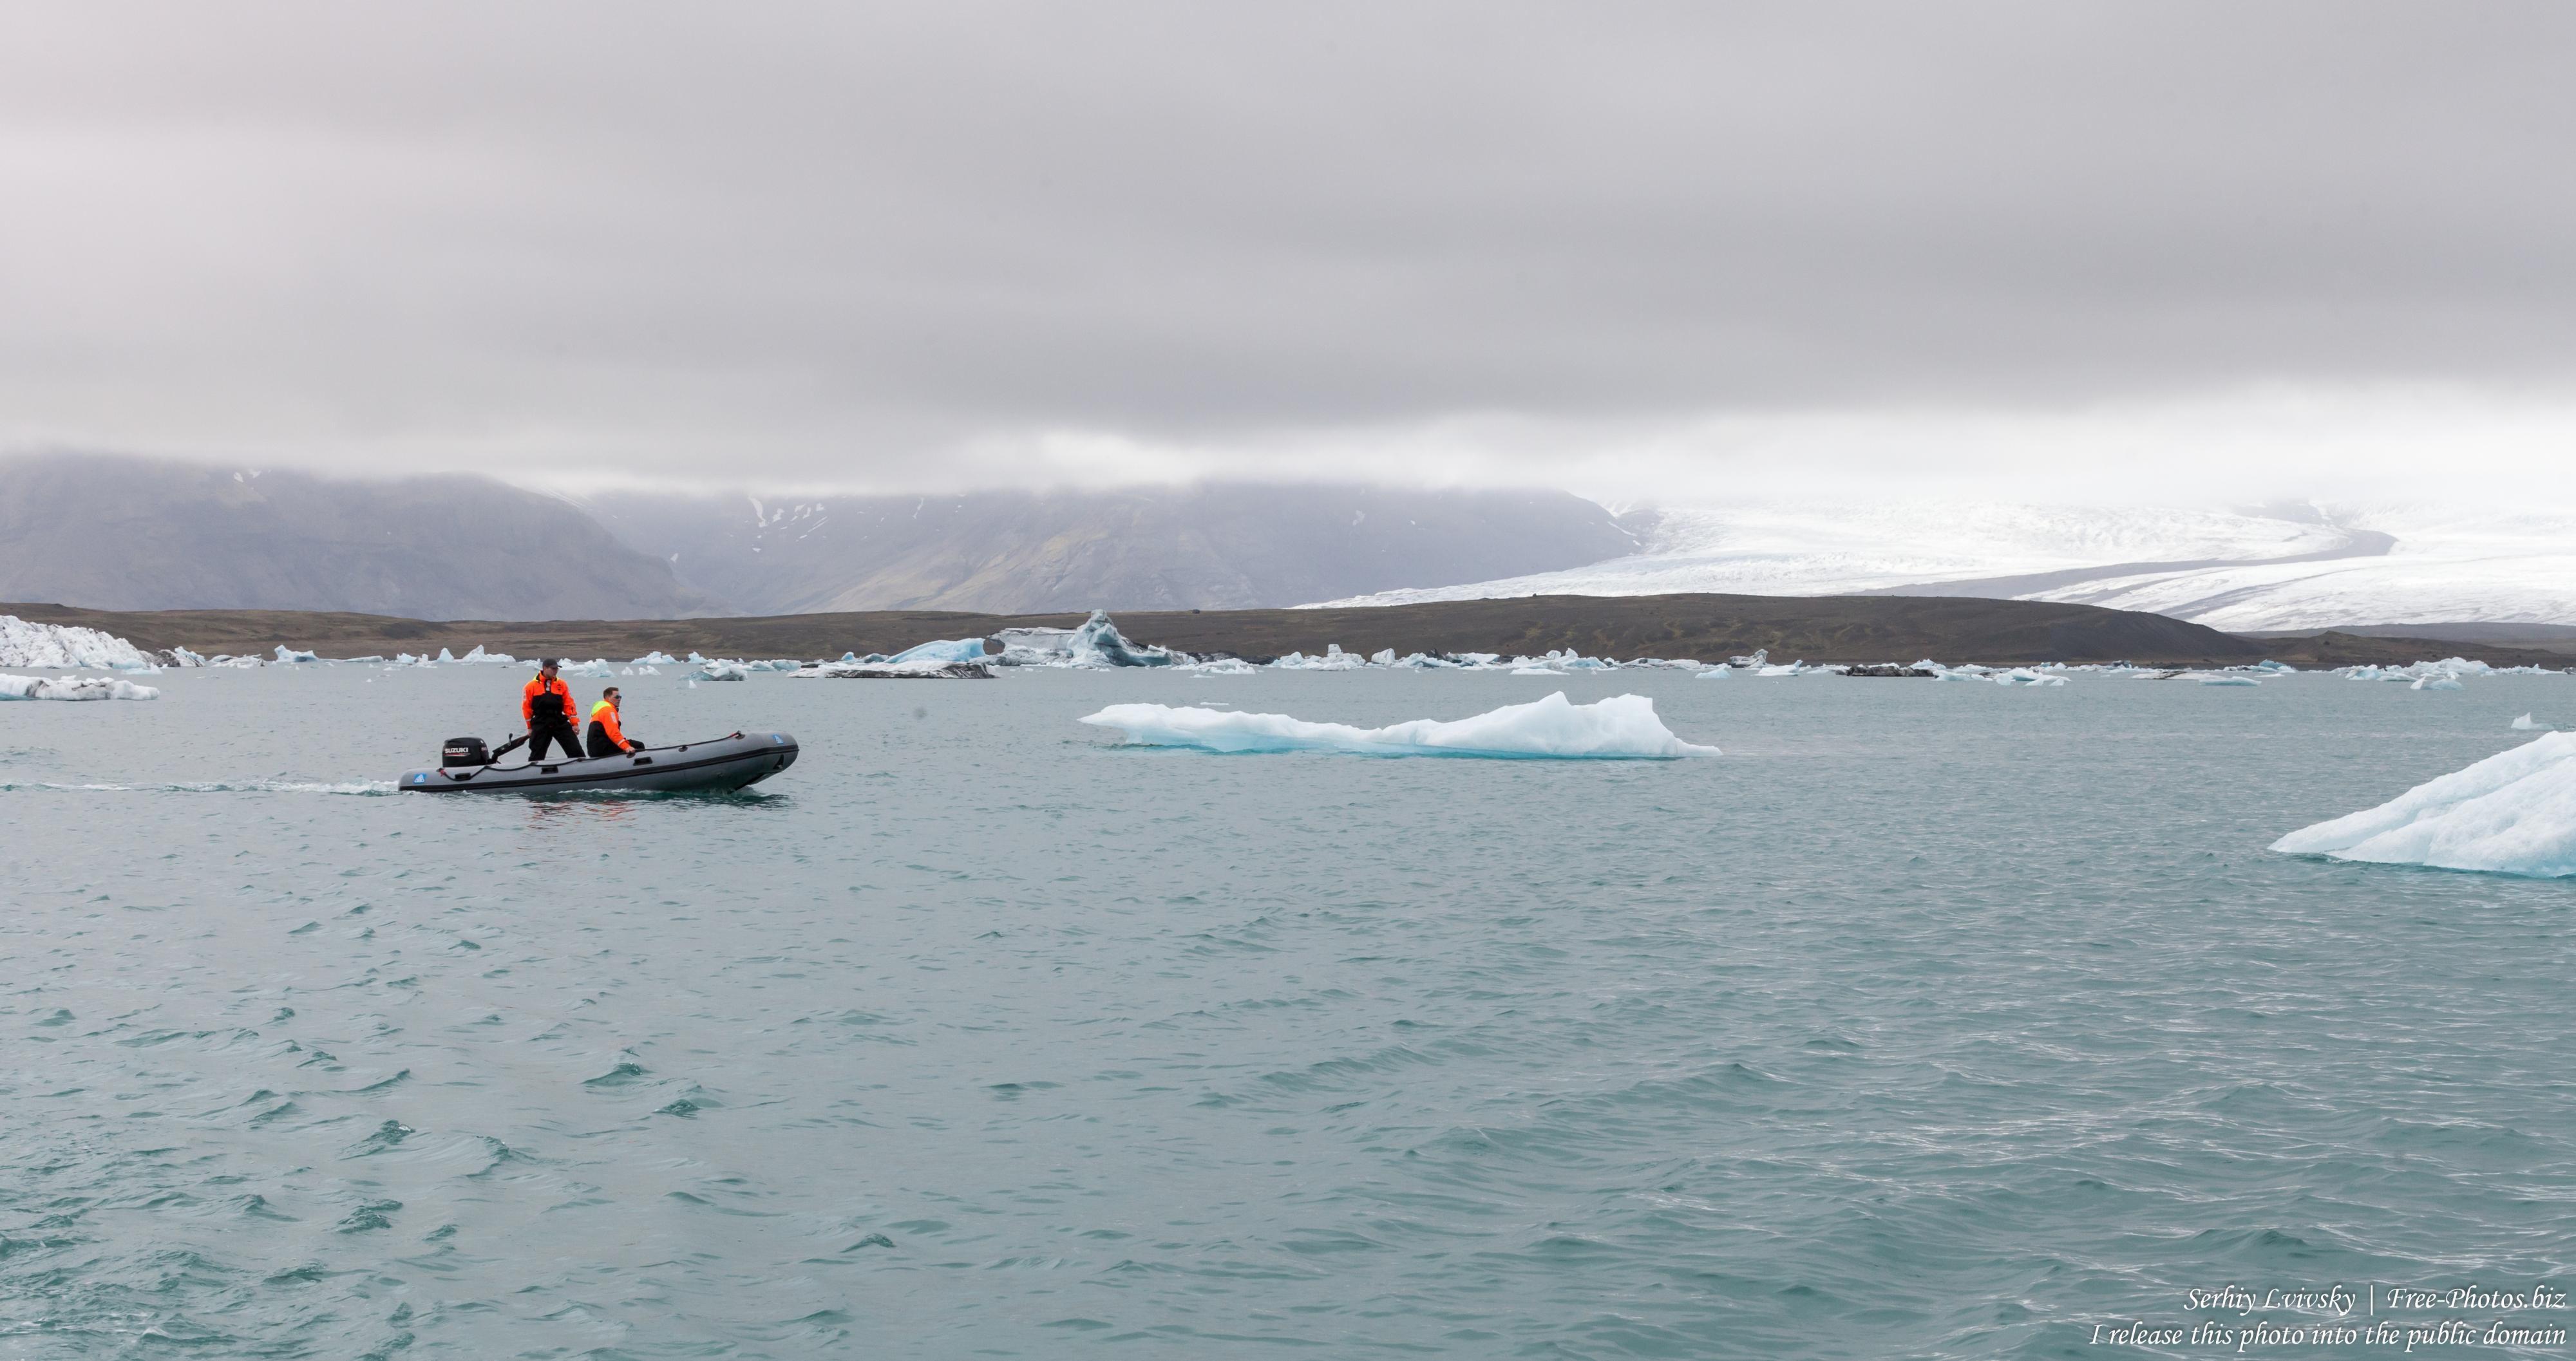 jokulsarlon_glacier_lagoon_iceland_in_may_2019_photographed_by_serhiy_lvivsky_40